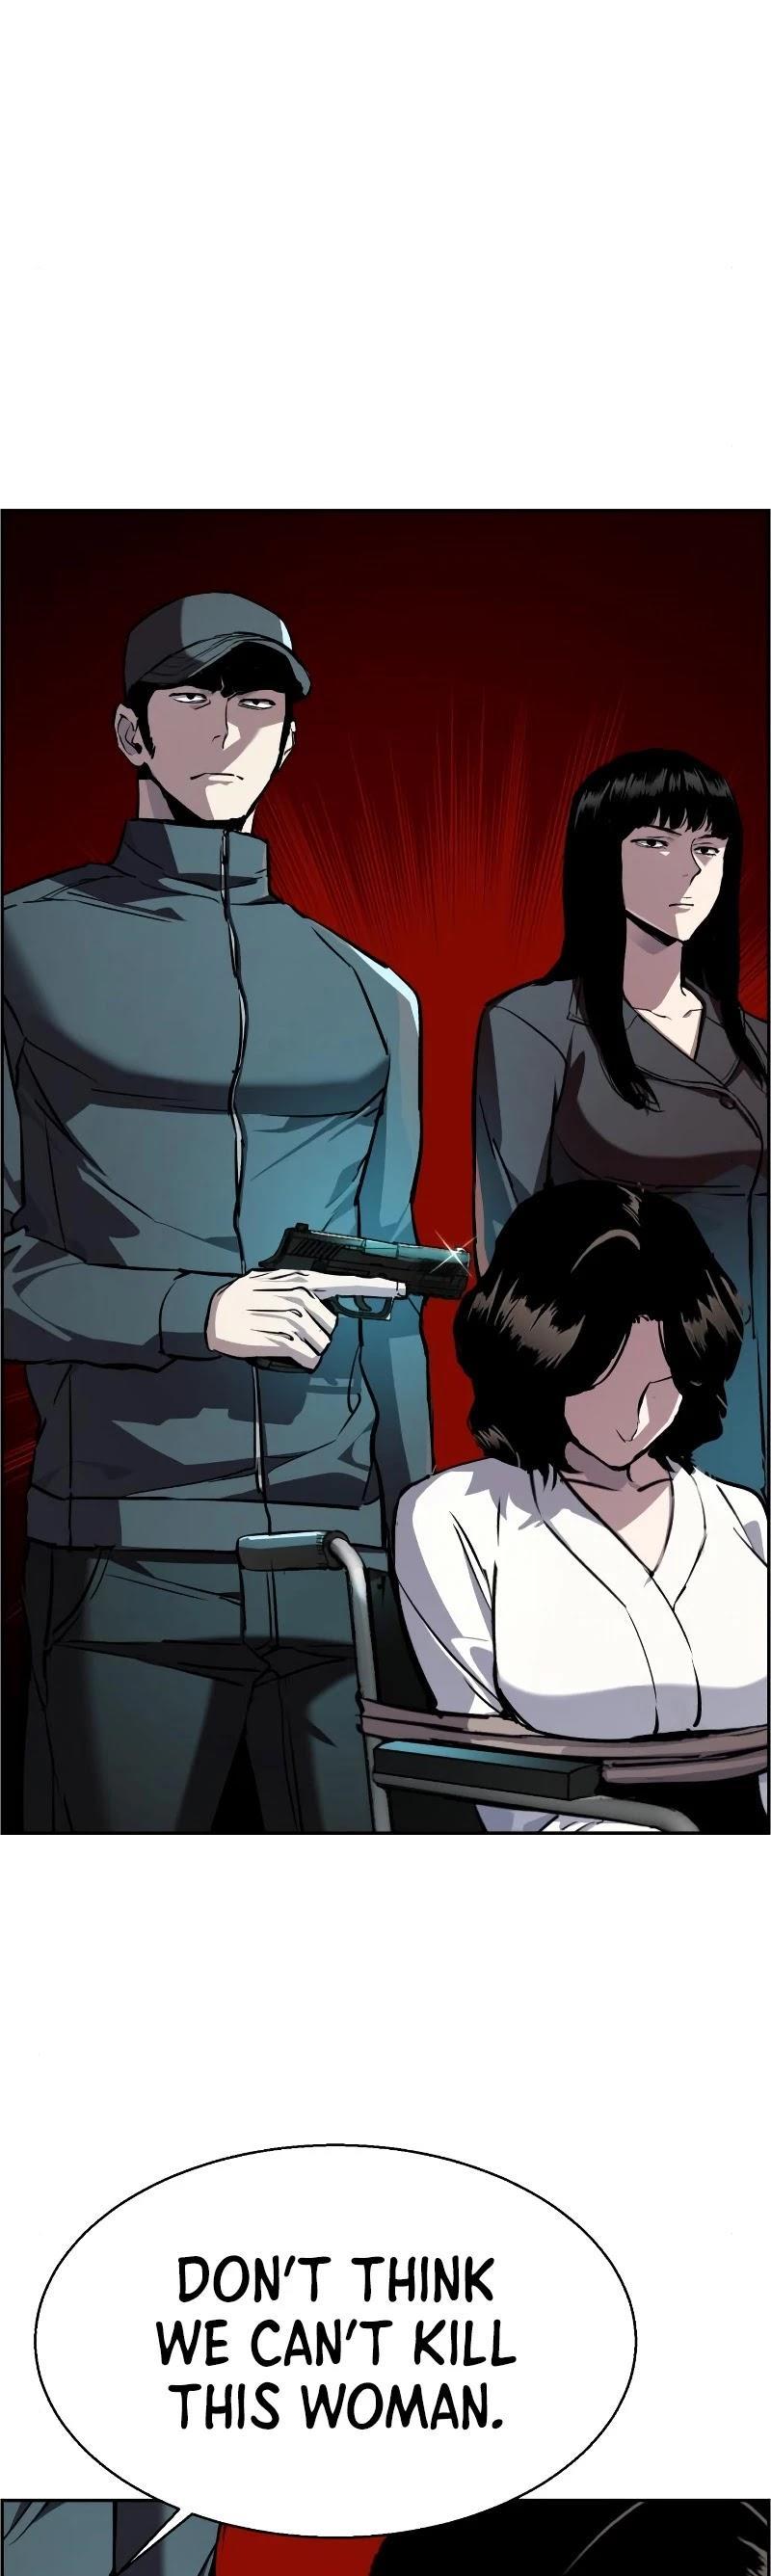 Mercenary Enrollment Chapter 47 page 42 - Mangakakalot